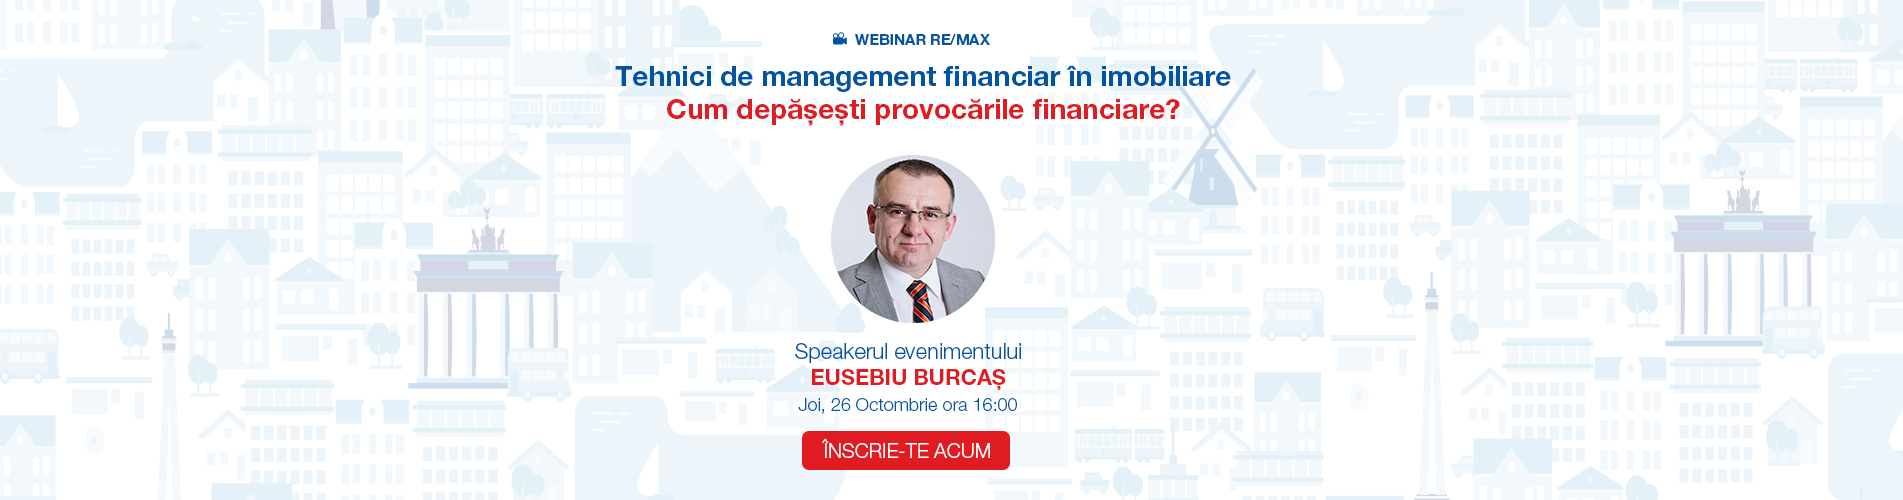 banner-webinarii-eusebiu-burcas.png